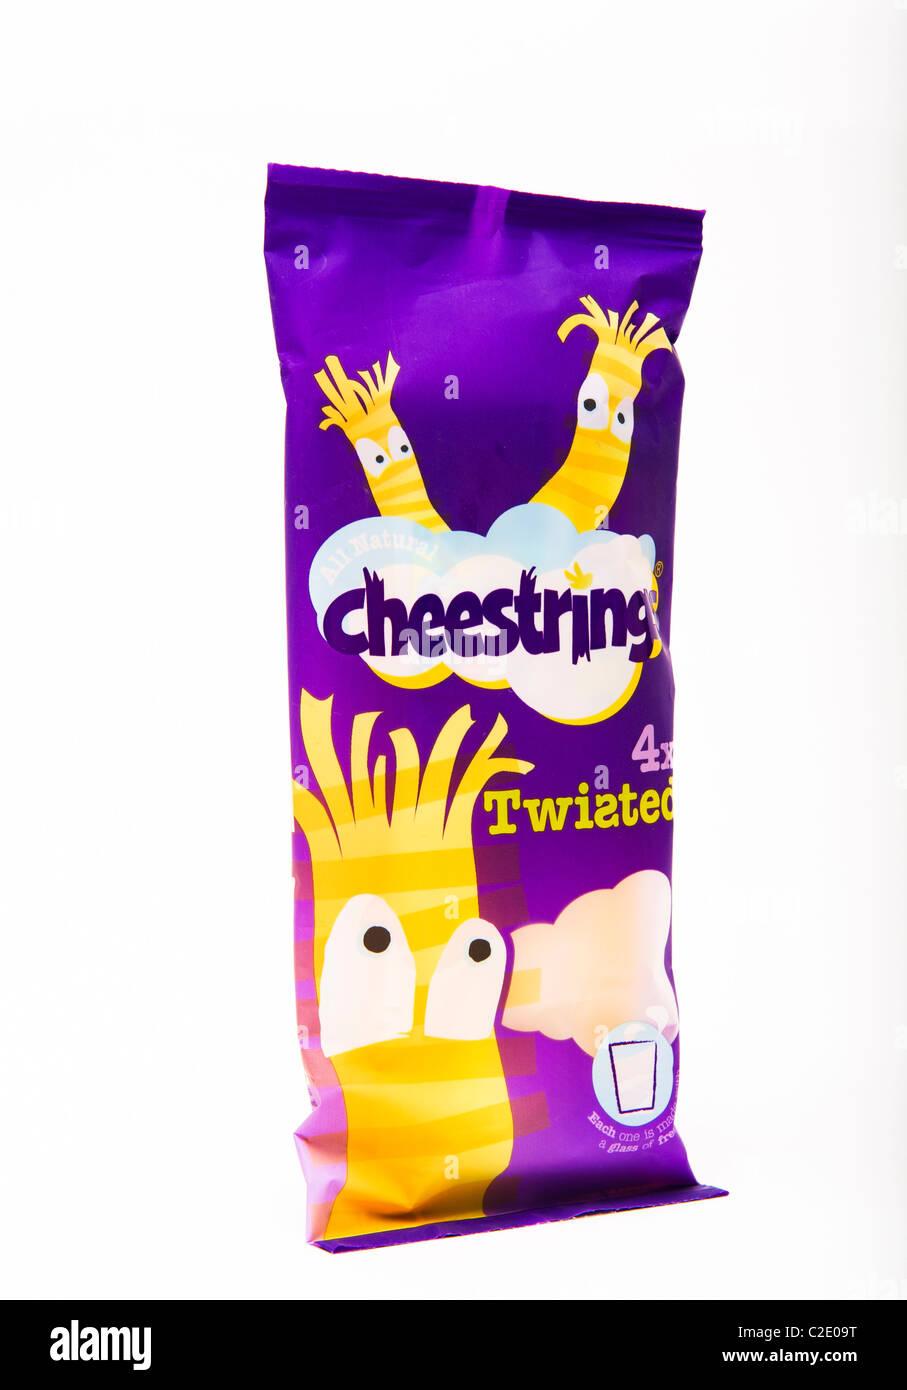 cheestrings 'cheese strings' - Stock Image